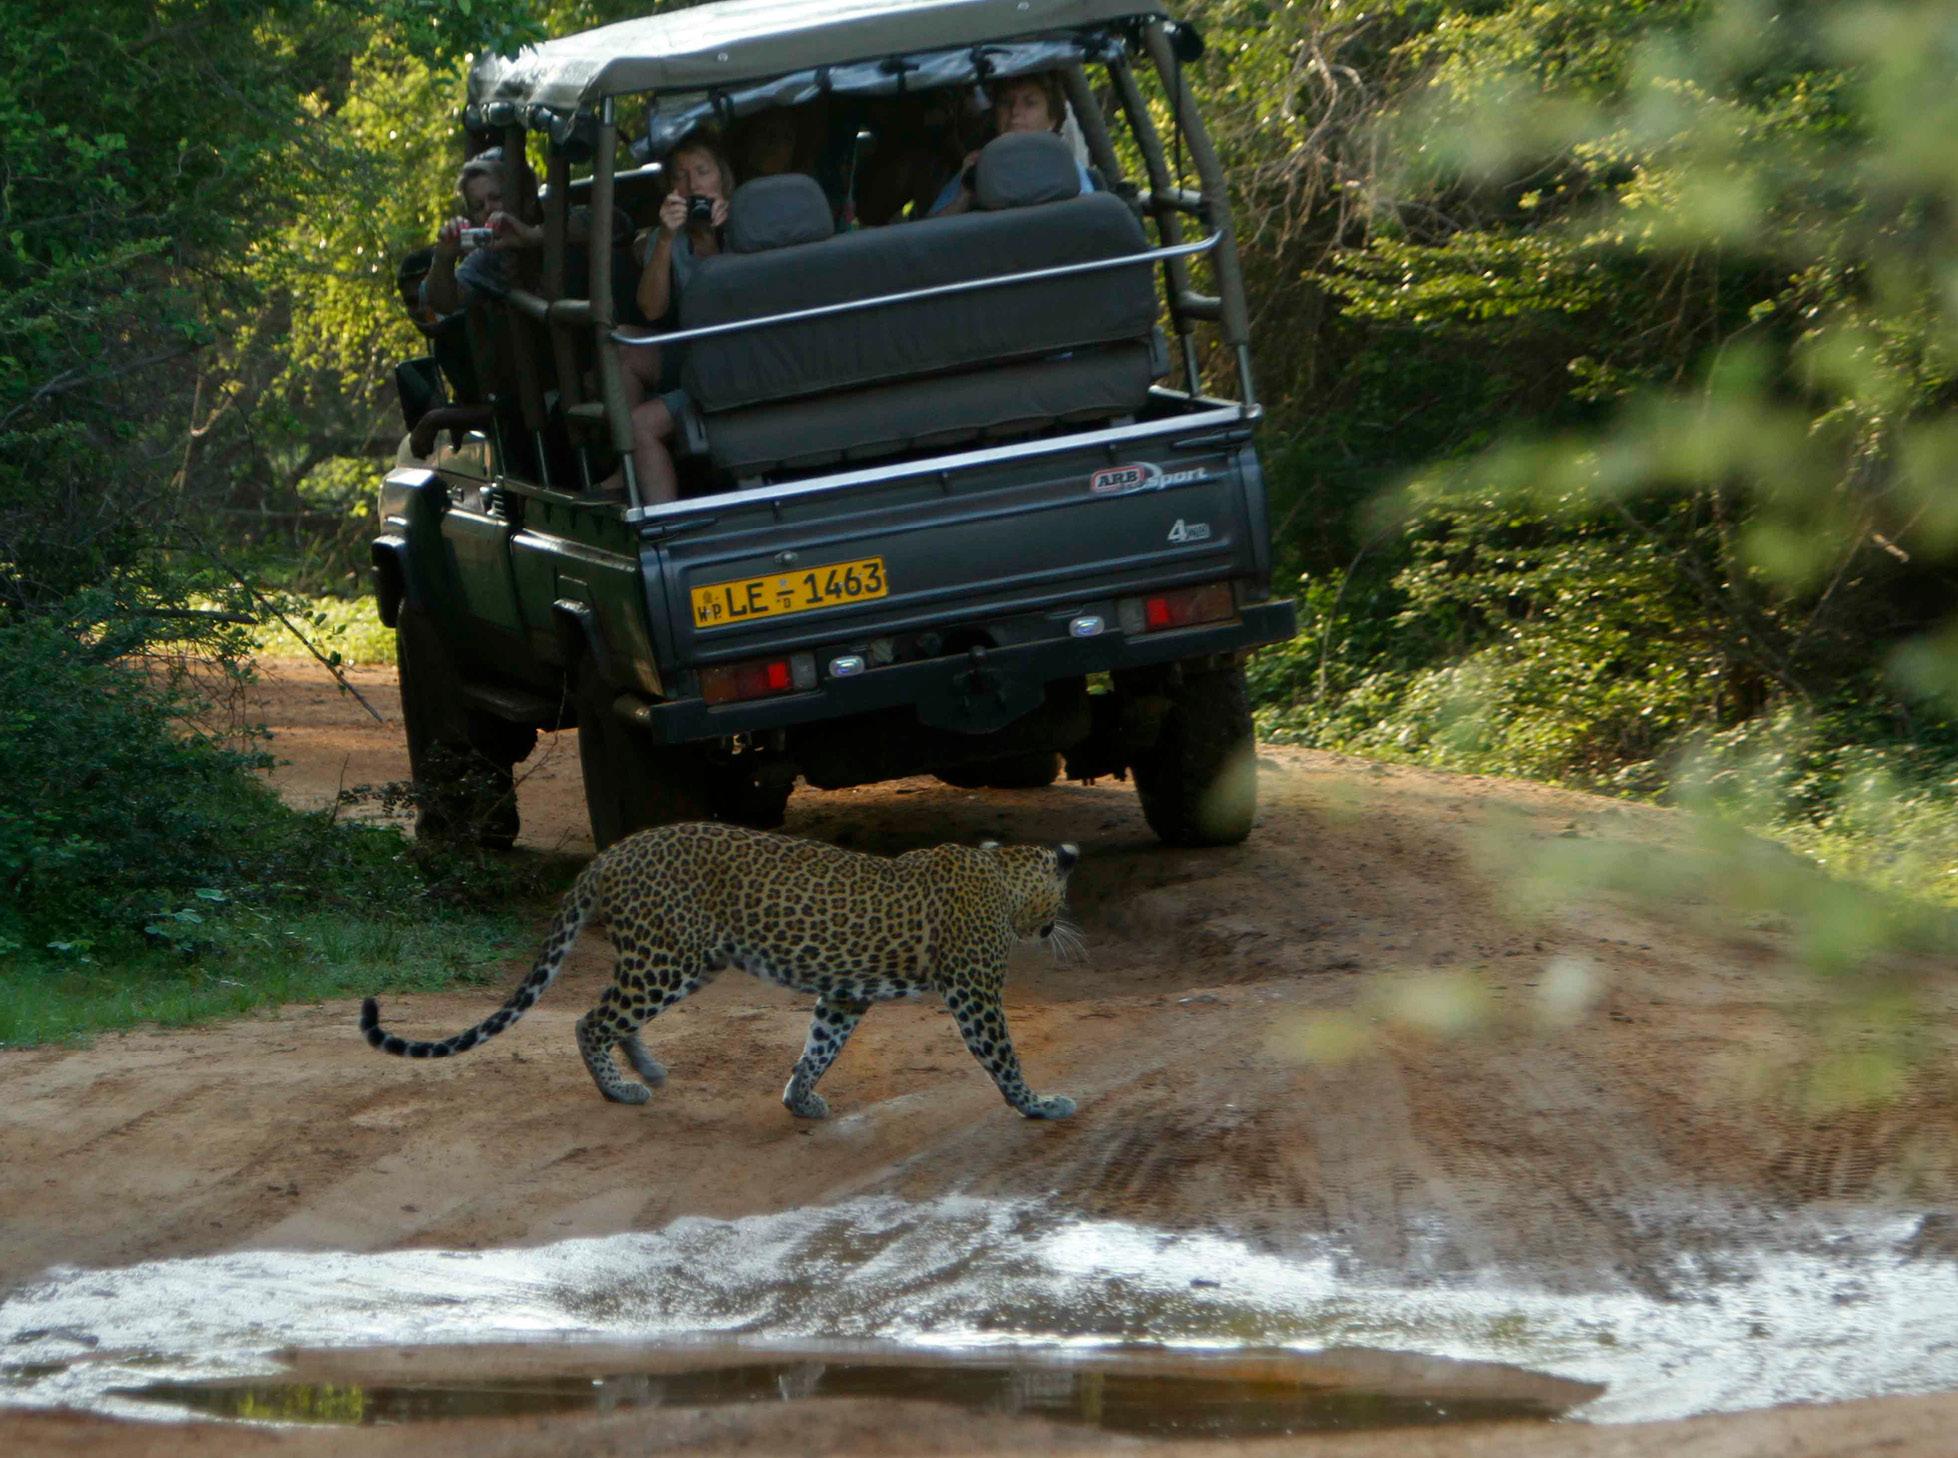 noel-rodrigo-leopard-safari-yala-national-park-sri-lanka-safari-leopard